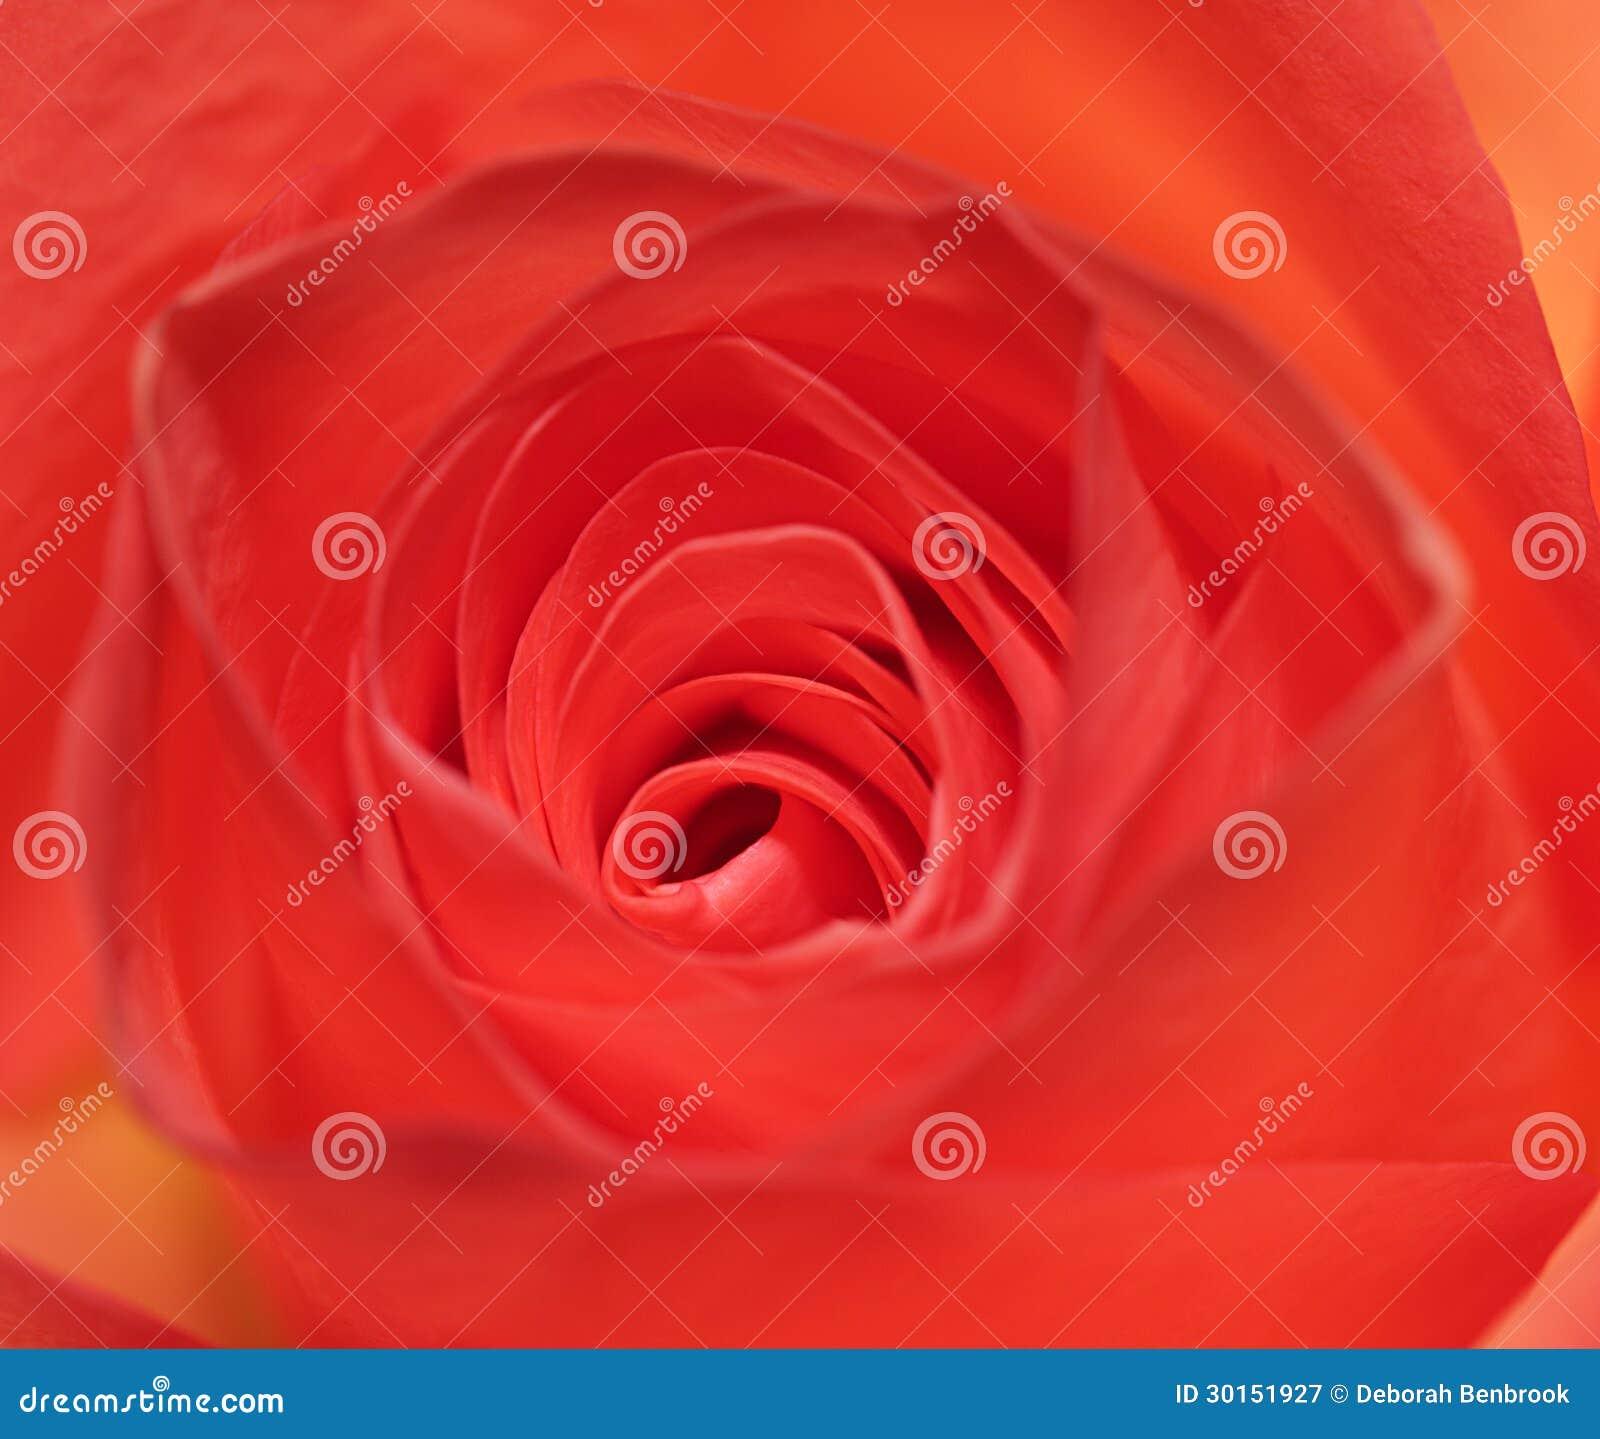 Centre of a rose